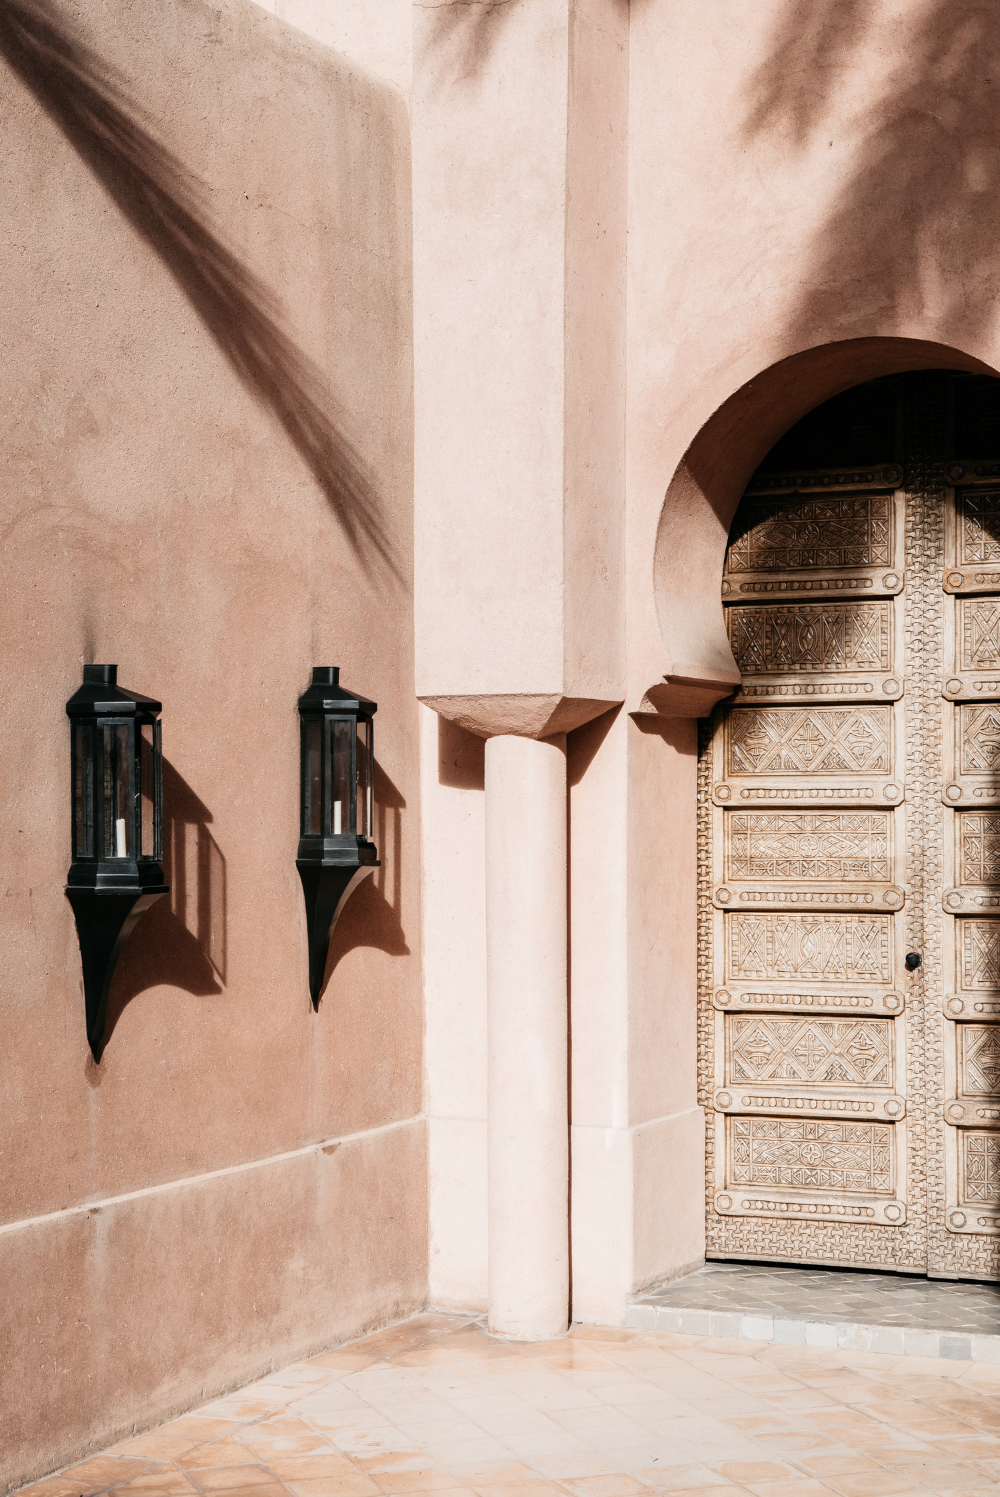 Amanjena, Marrakech — One Thousand and One Nights